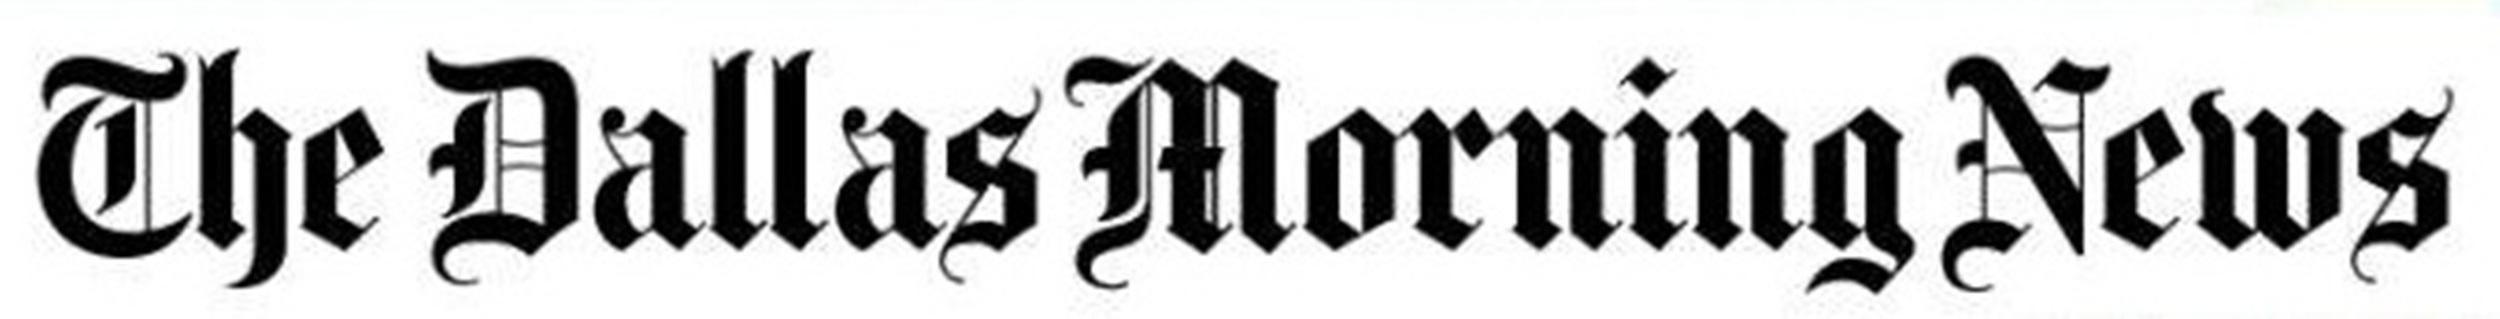 DMN logo.jpg